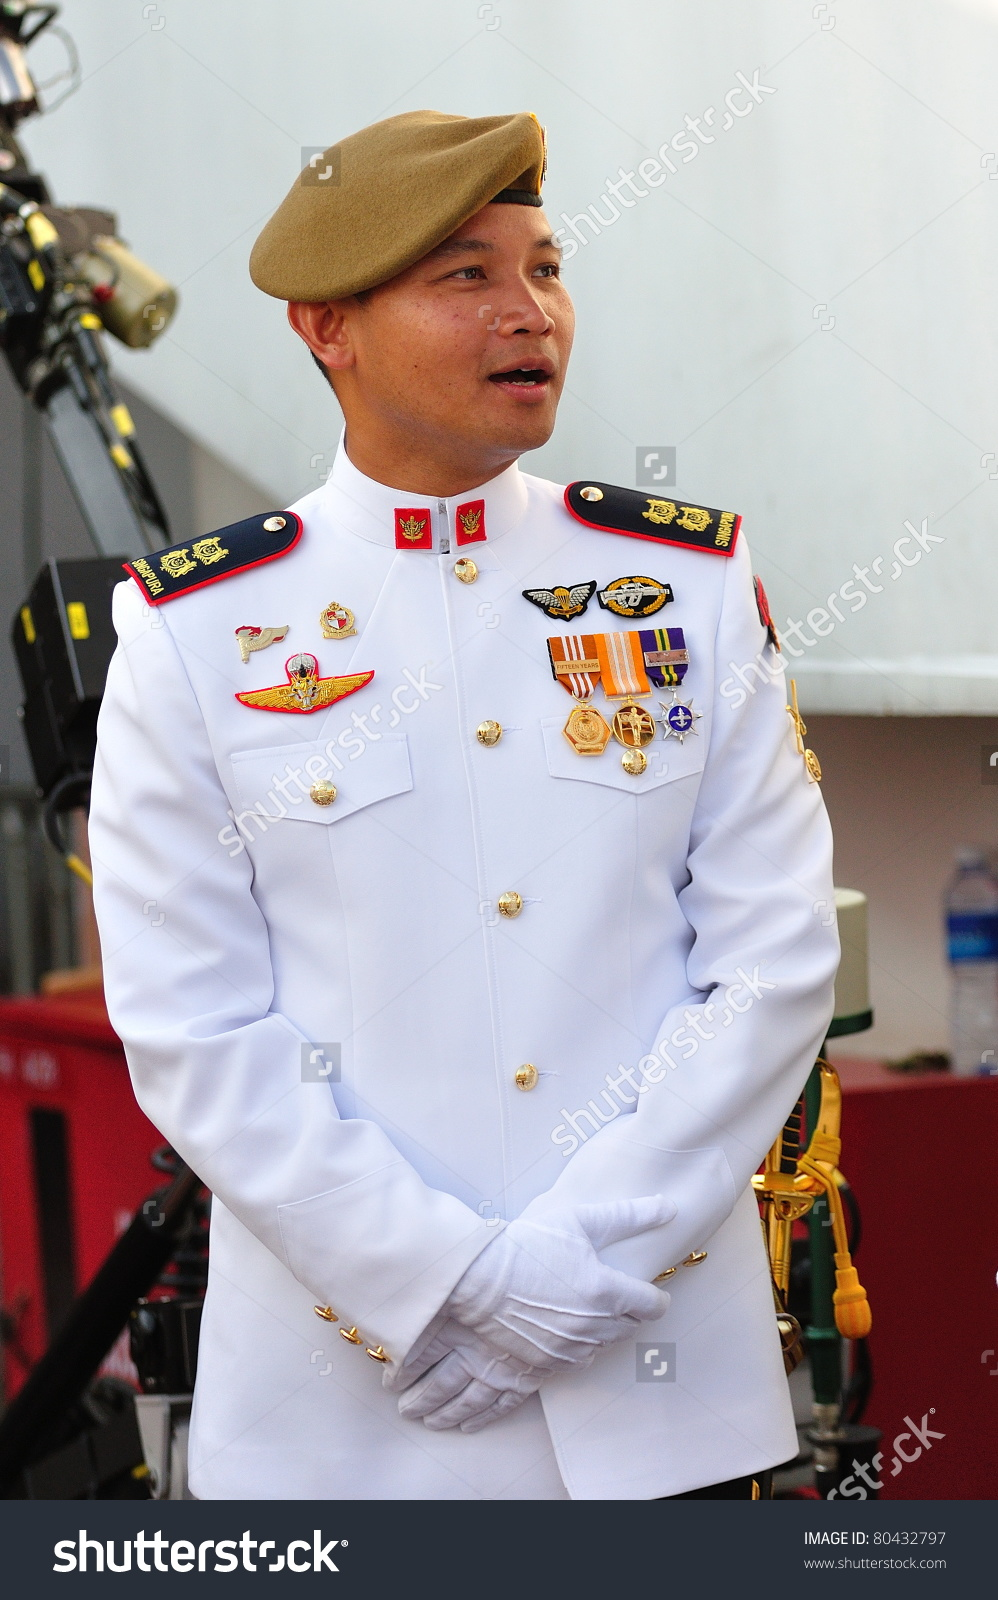 Parade commander clipart #3